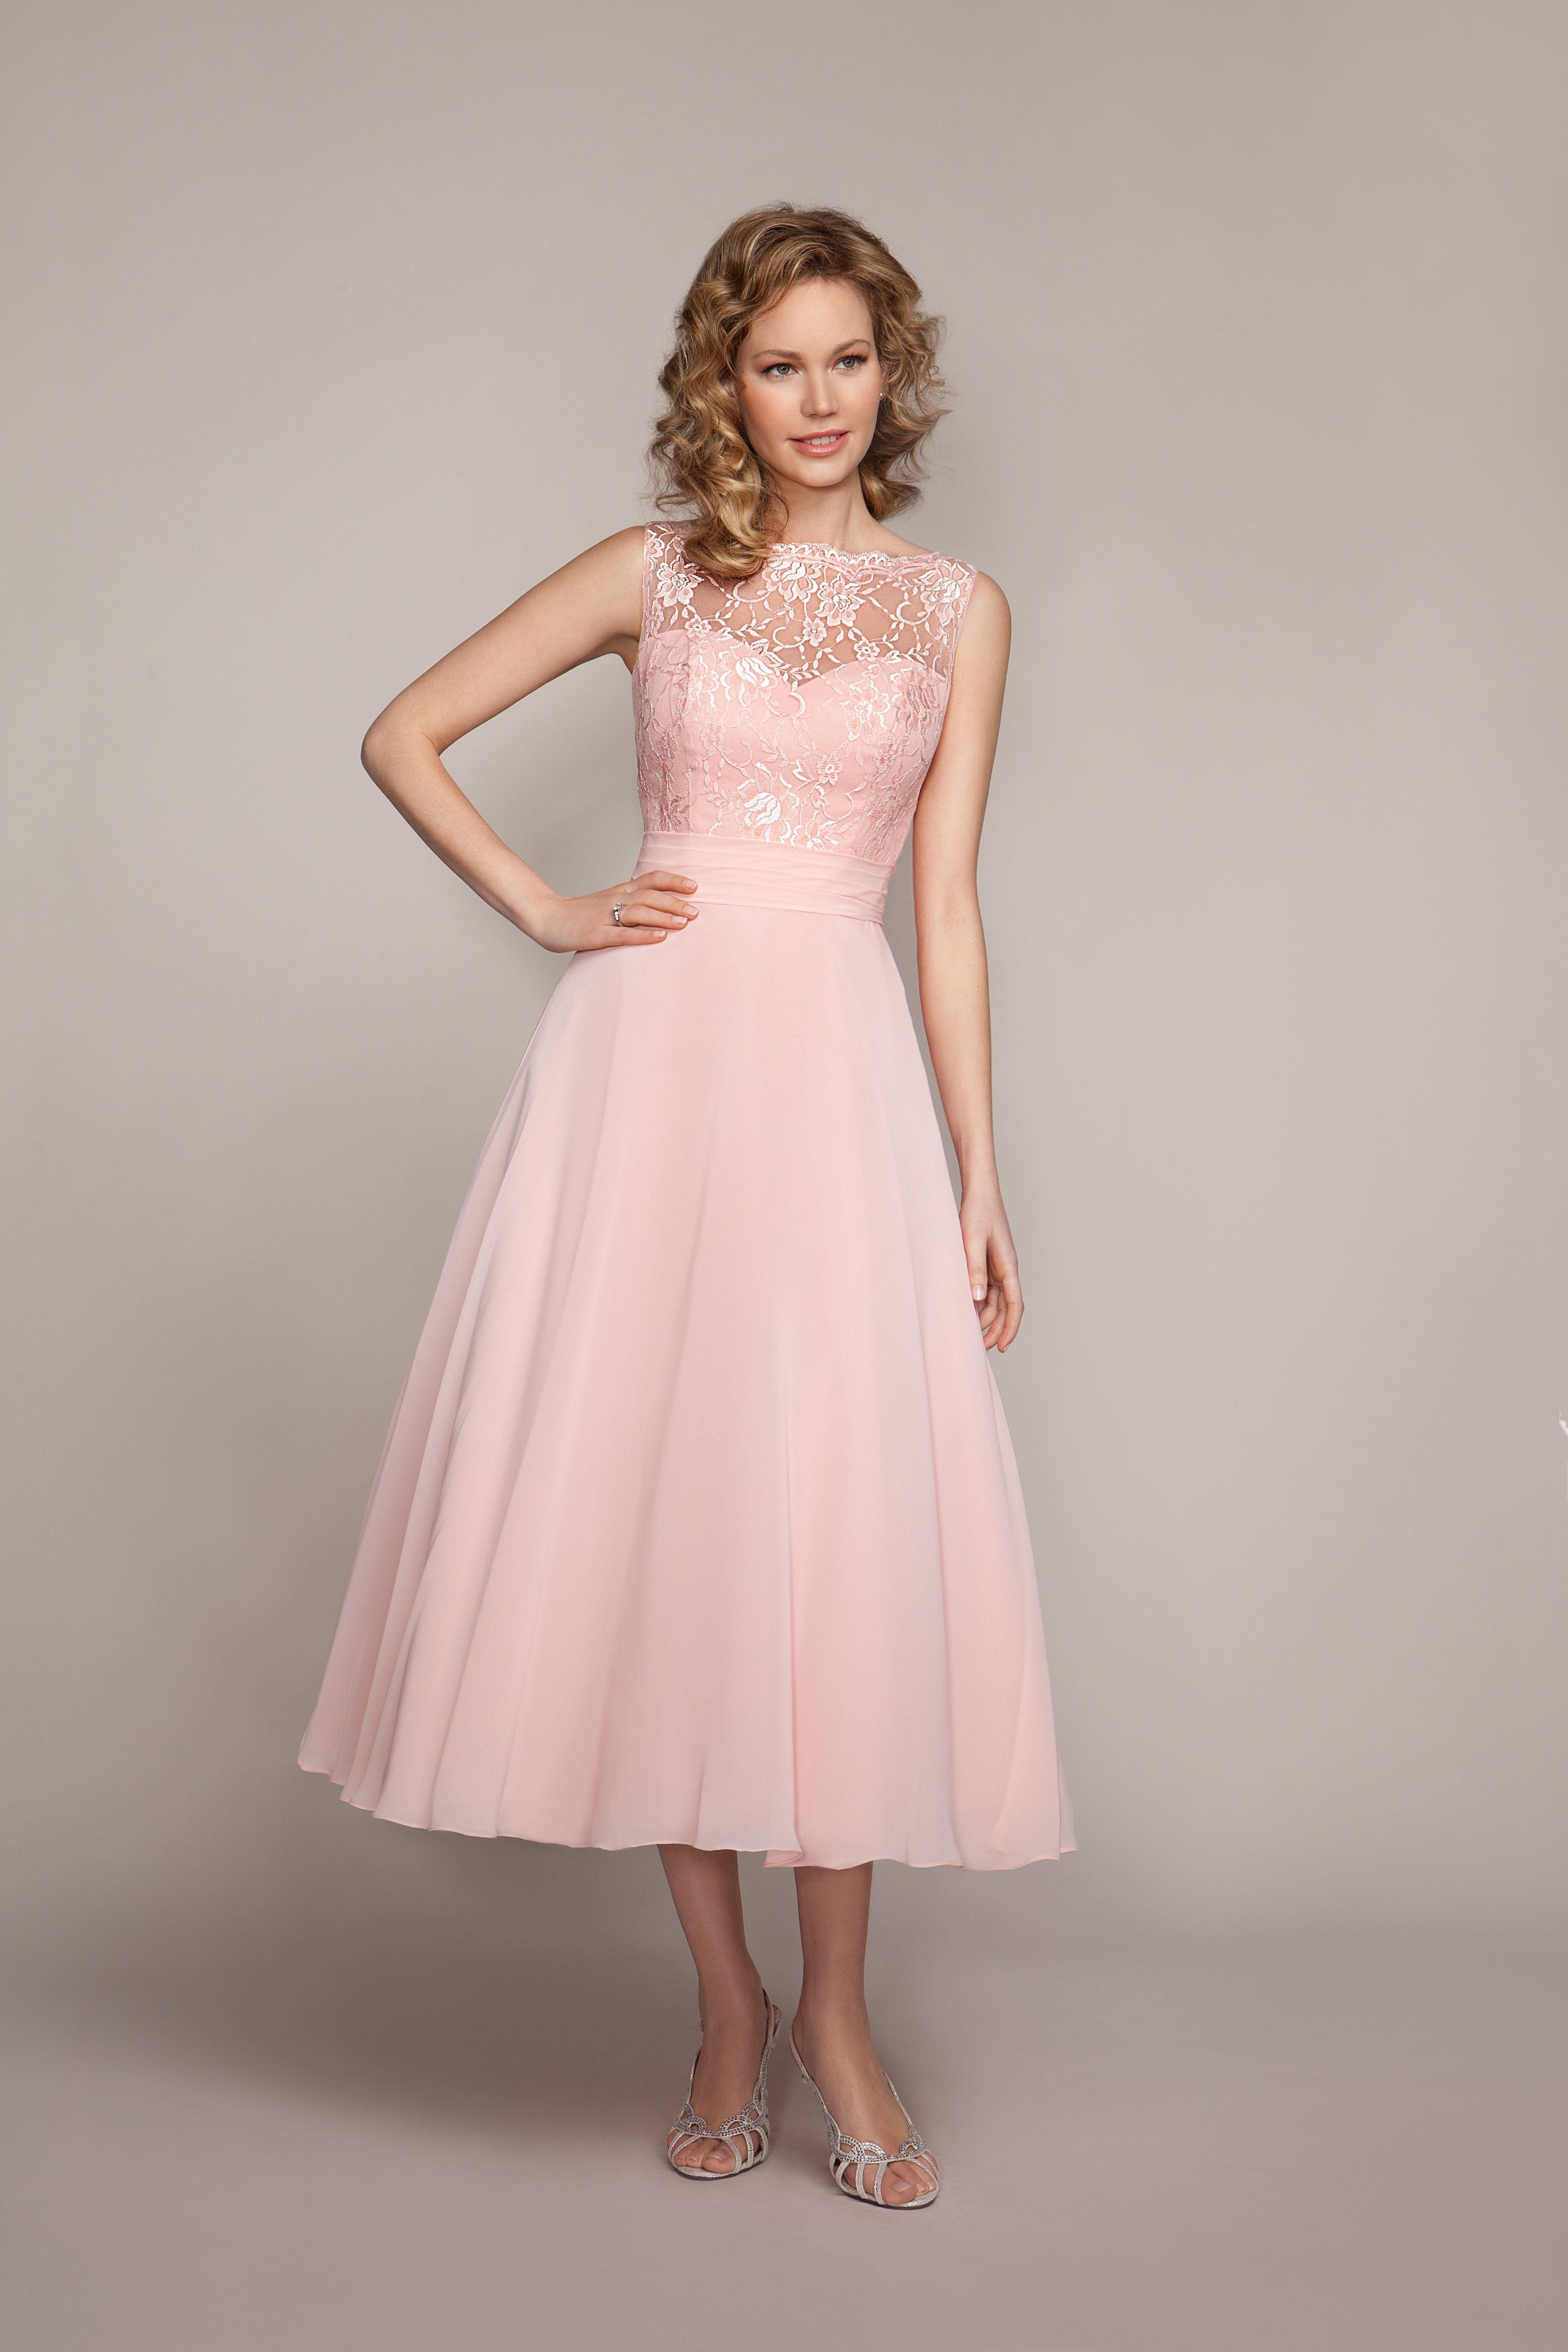 Mark Lesley 1525a Bridesmaid Dress